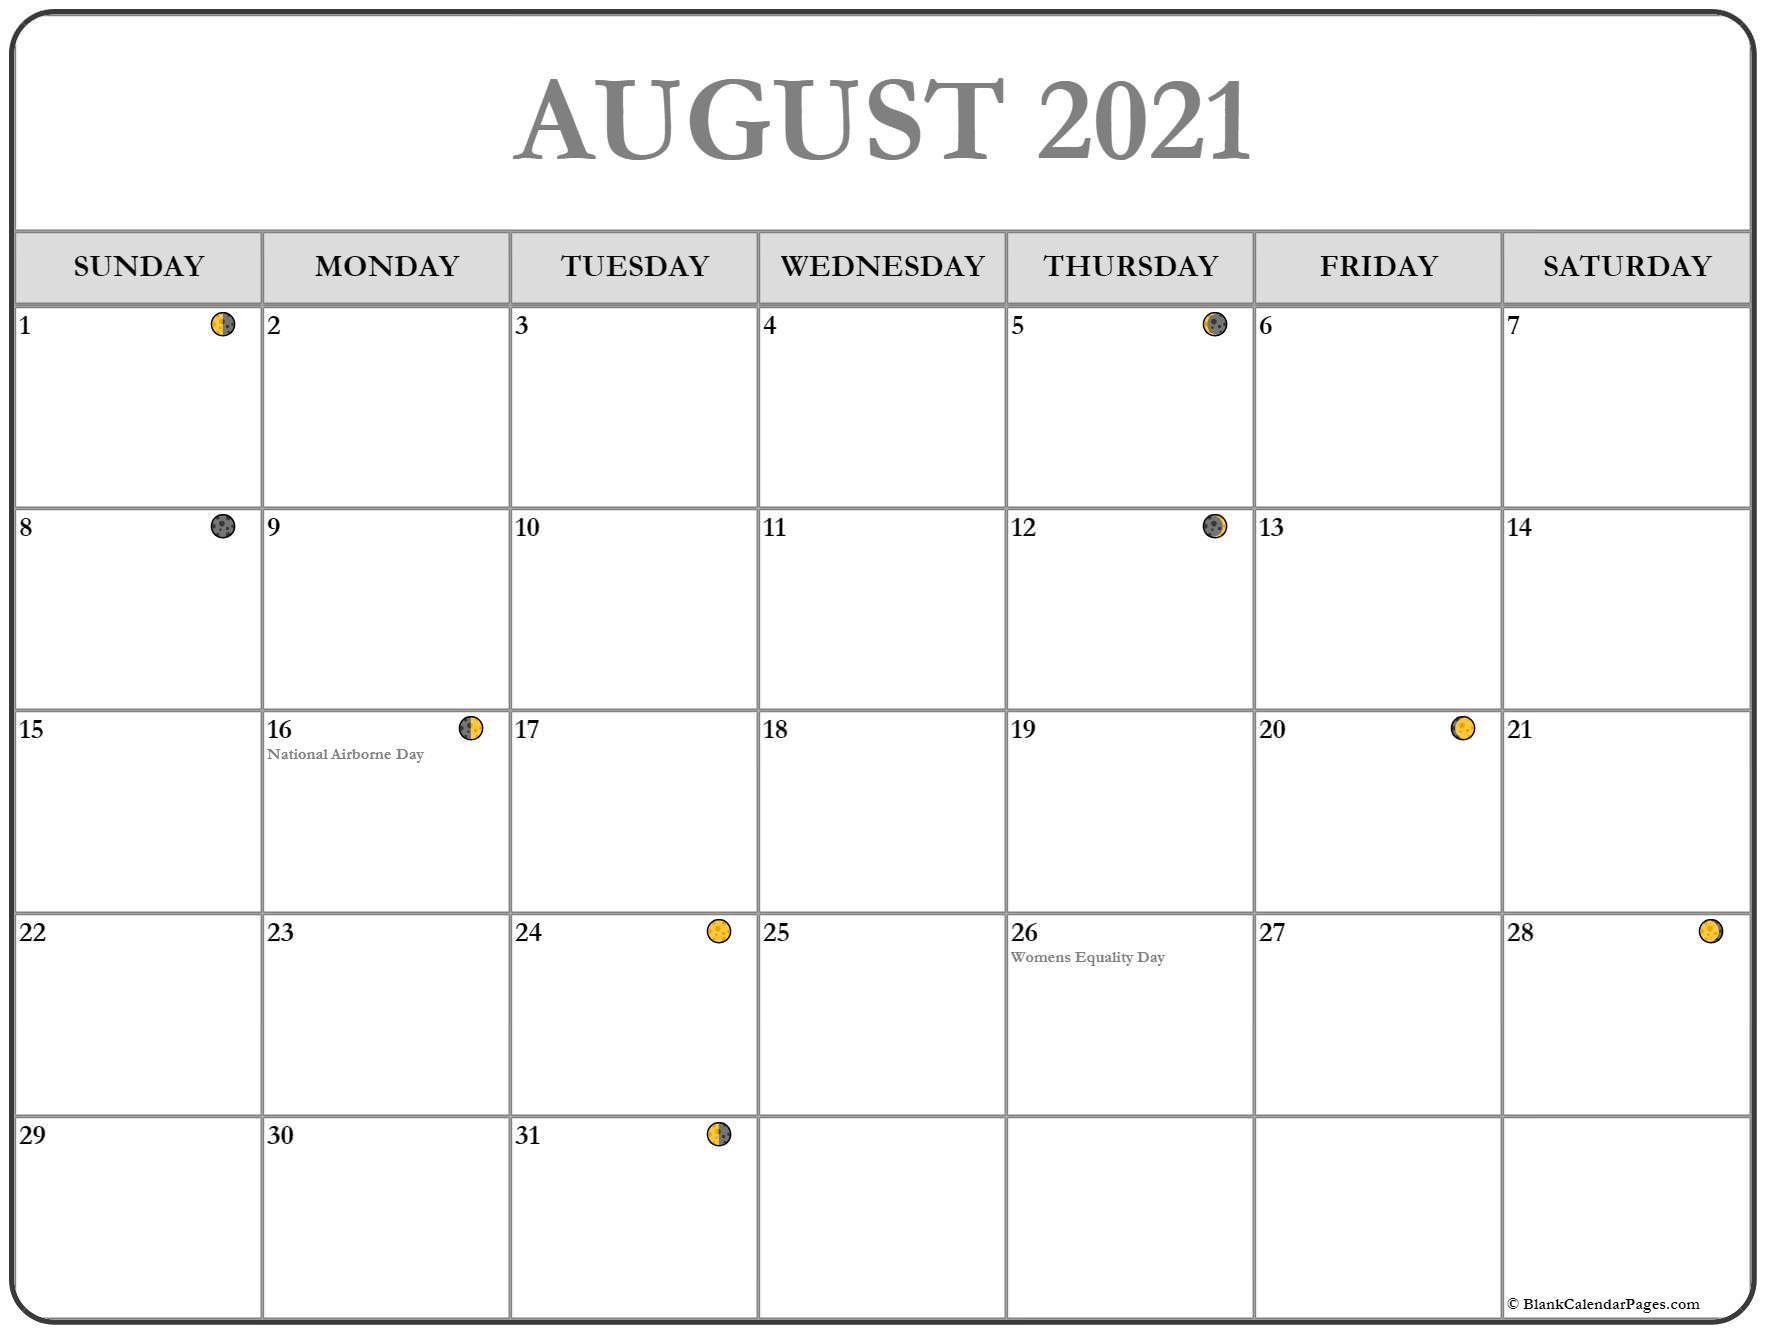 August 2021 Lunar Calendar   Moon Phase Calendar With Regard To Moon Calendar 2021 Name And Date For Kids